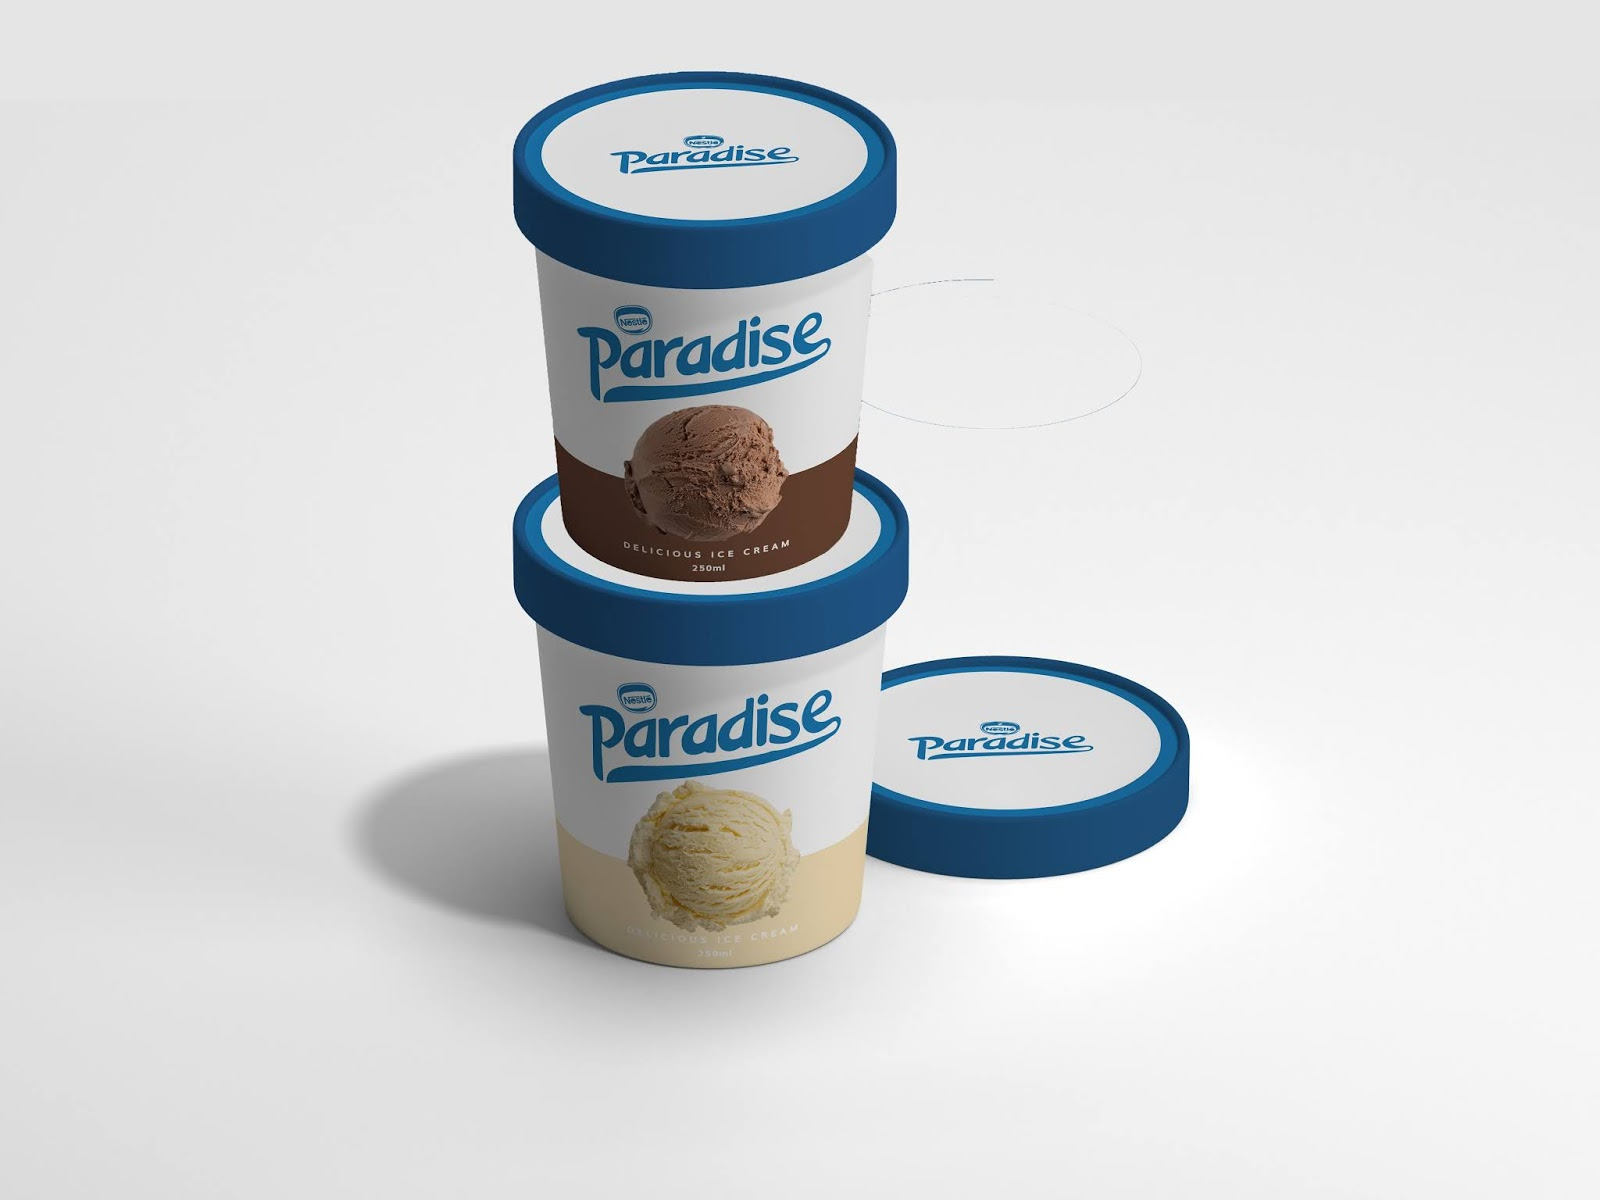 Paradise Ice Cream